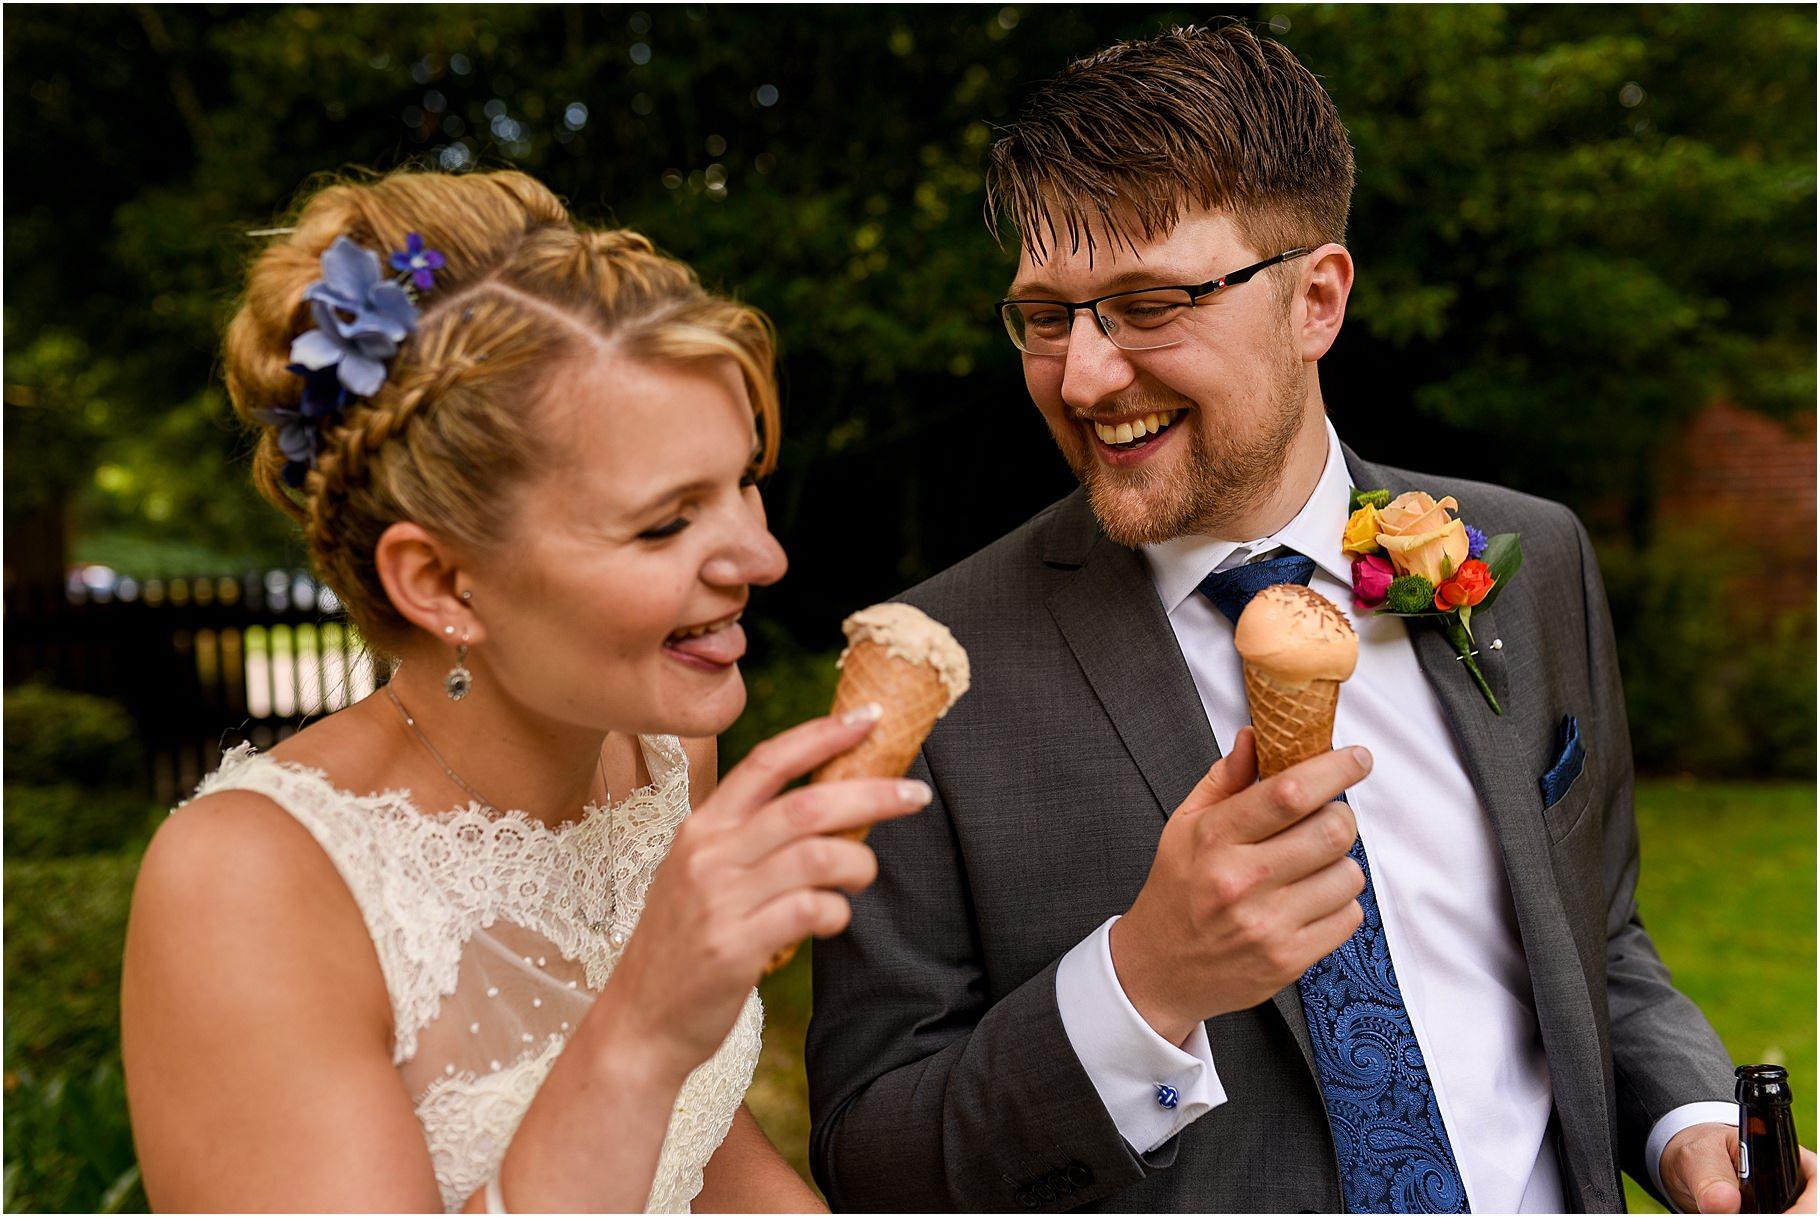 dan-wootton-photography-2017-weddings-084.jpg